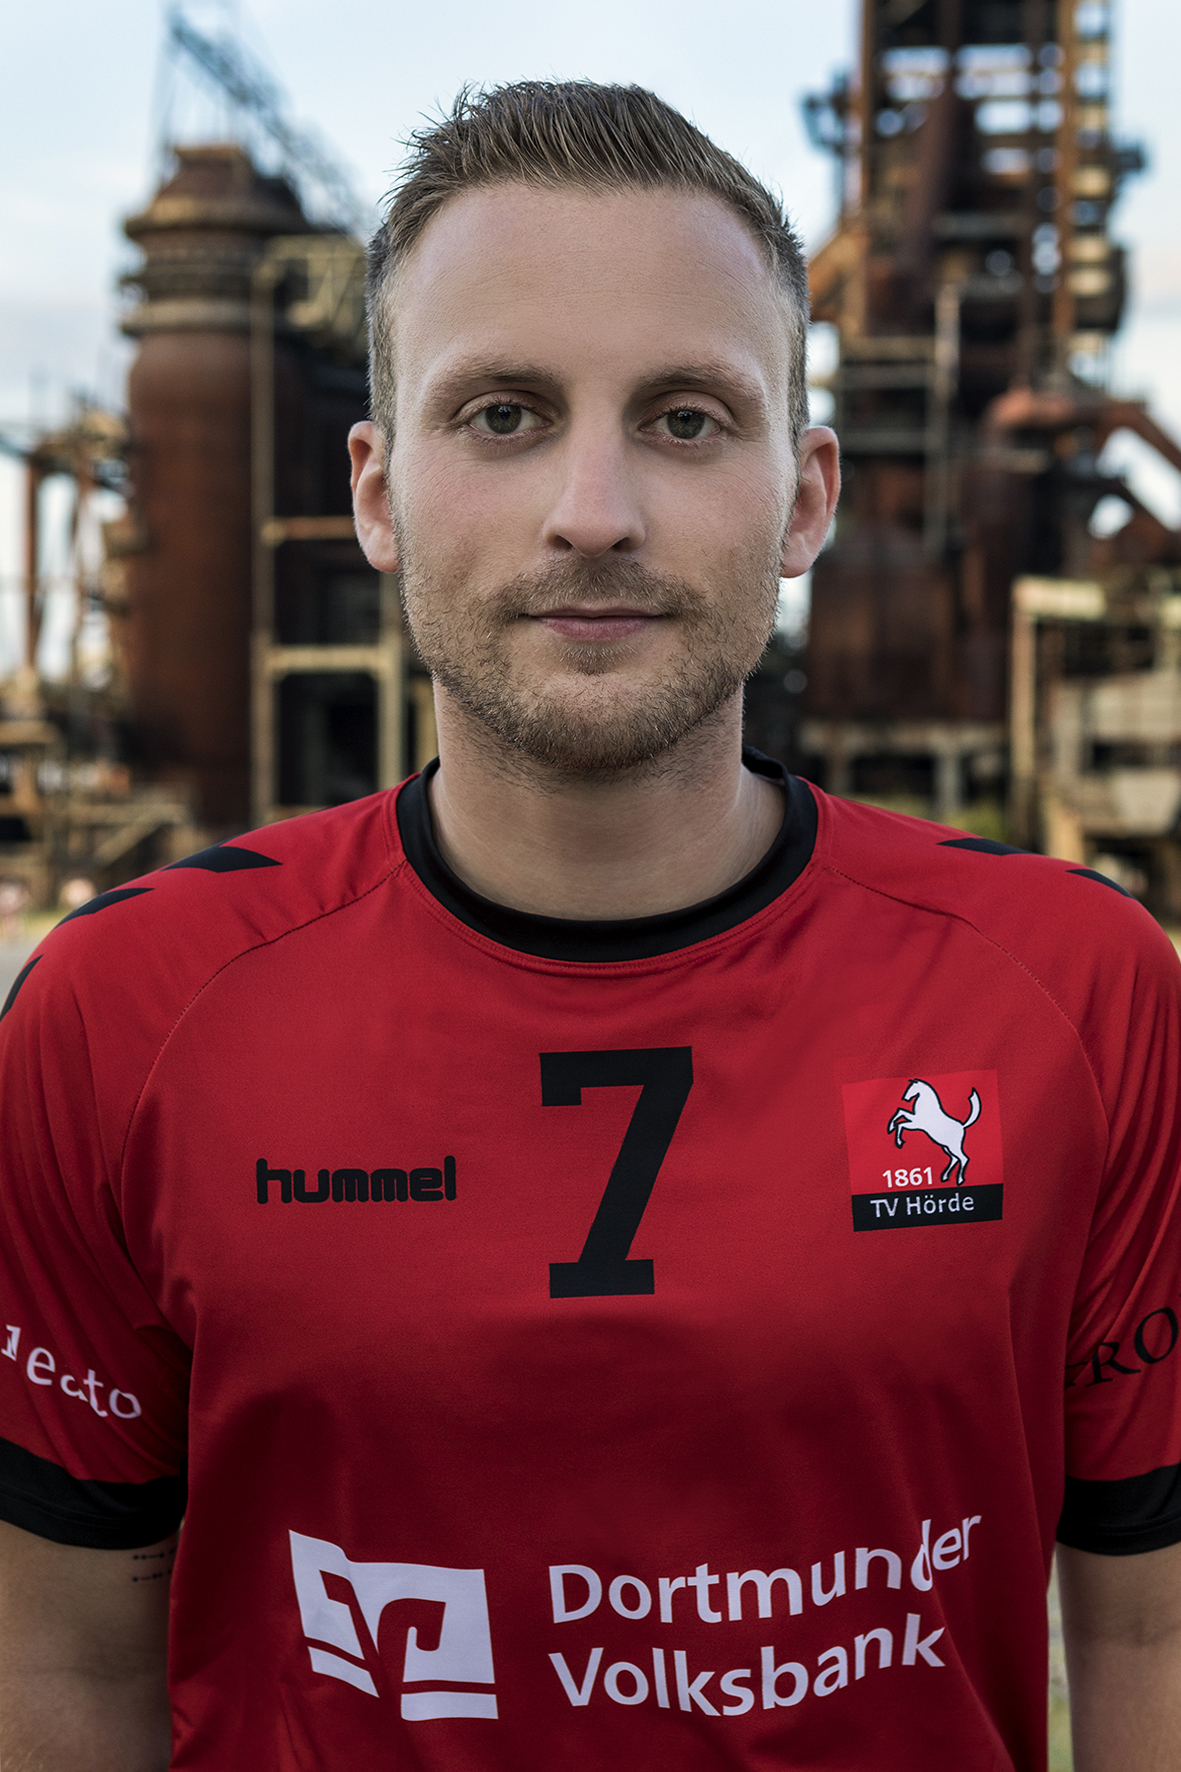 7 - Christoph Bielecki